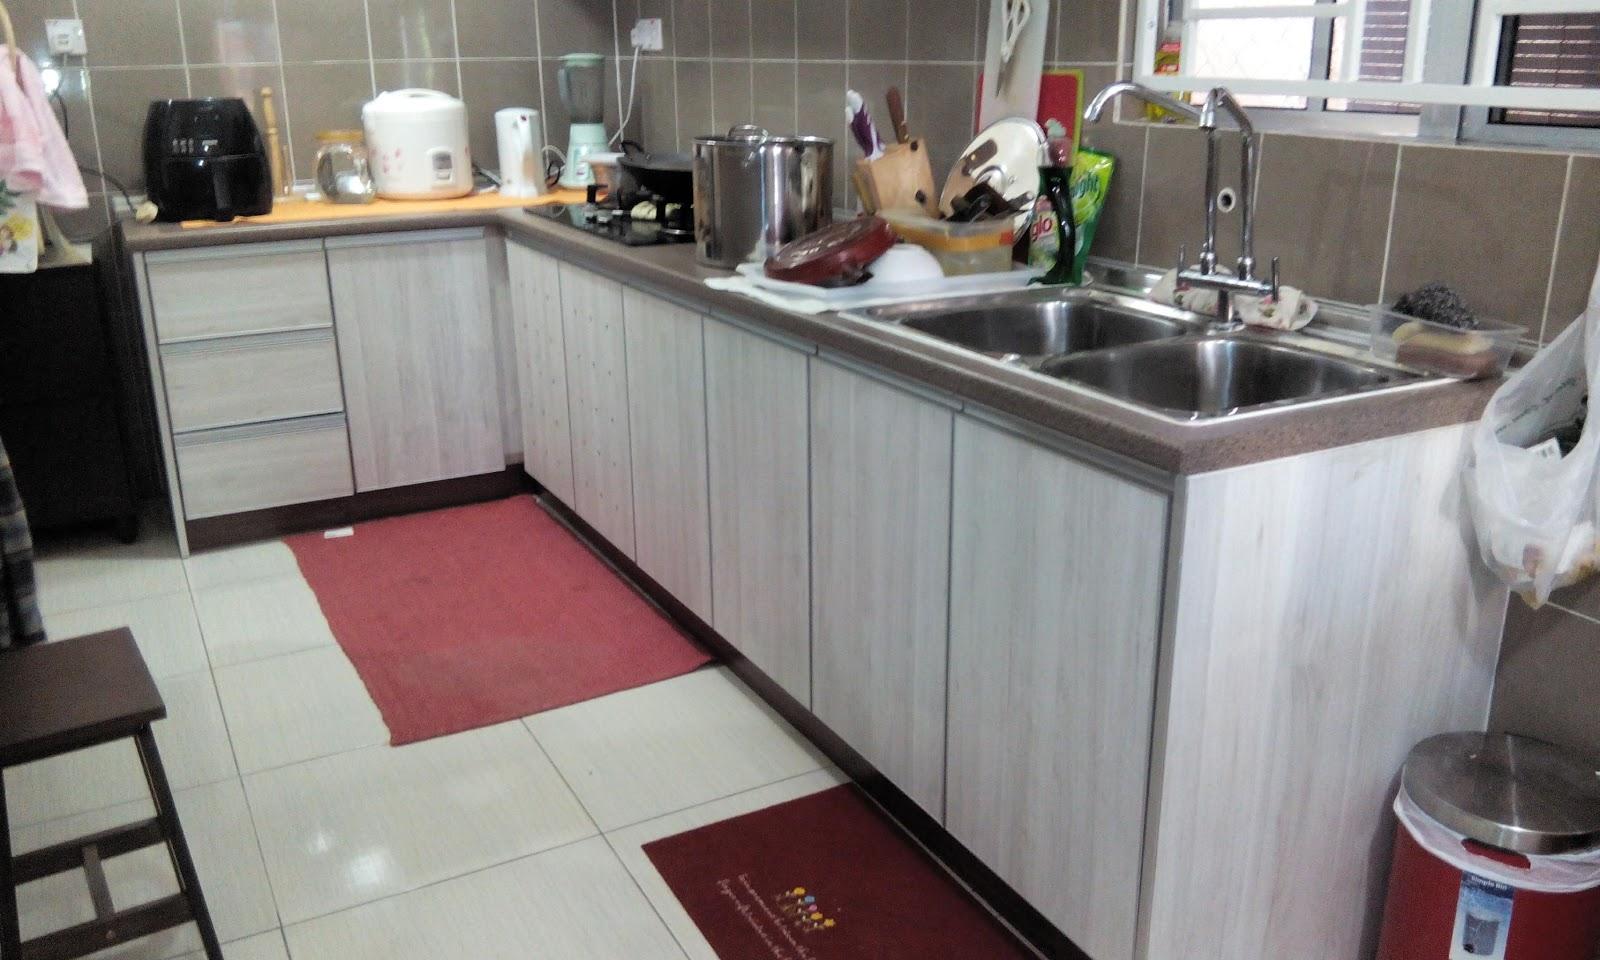 Material Yang Di Gunakan Utk Rumah Tuan Haji Ni Adalah Spt Milamine Board Beserta Kekemasan Edging Aluminium Handle Profail Wow Simple Dan Cantik Gitu